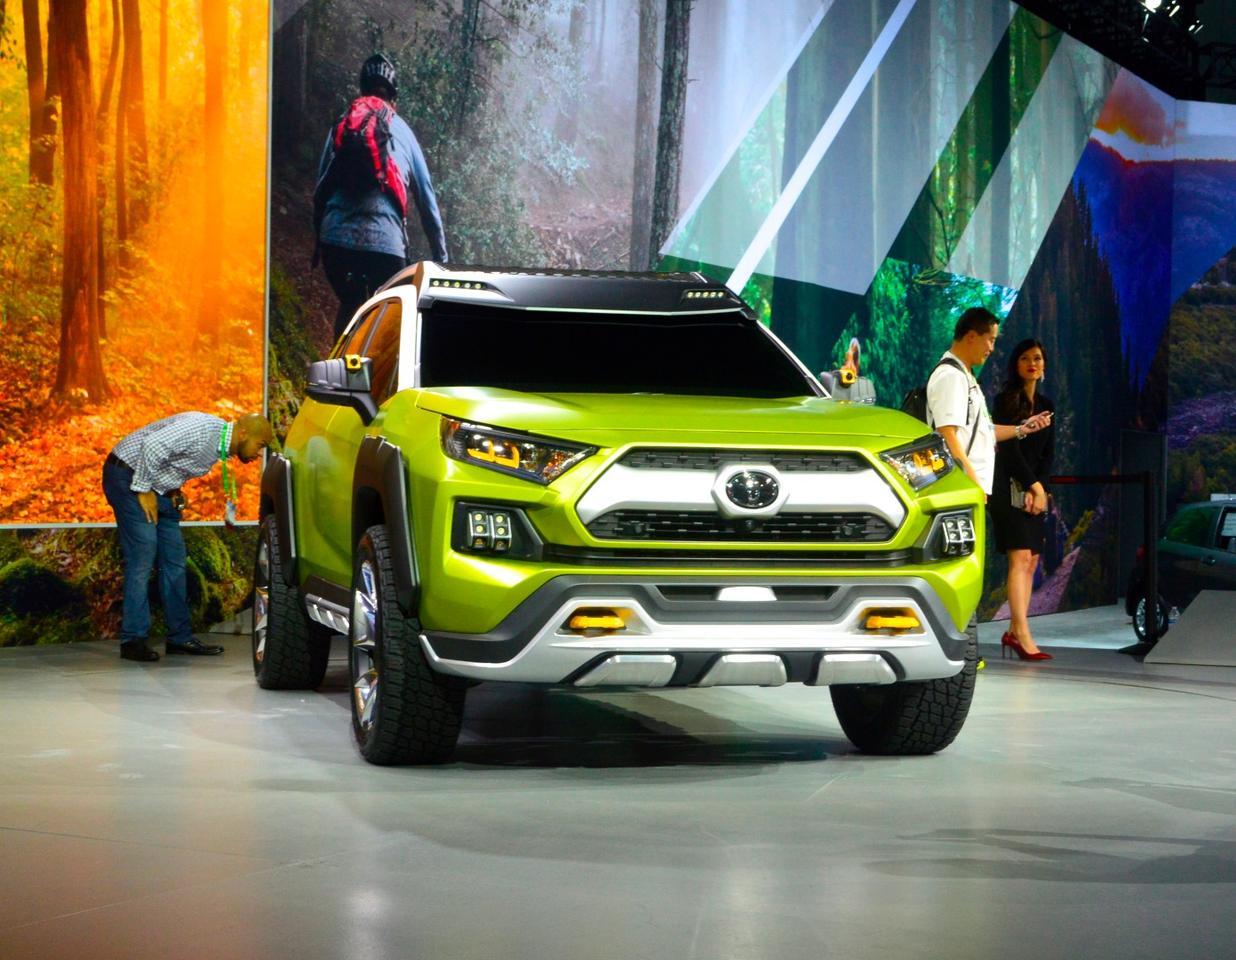 Toyota reveals the FT-AC concept at the 2017 LA Auto Show